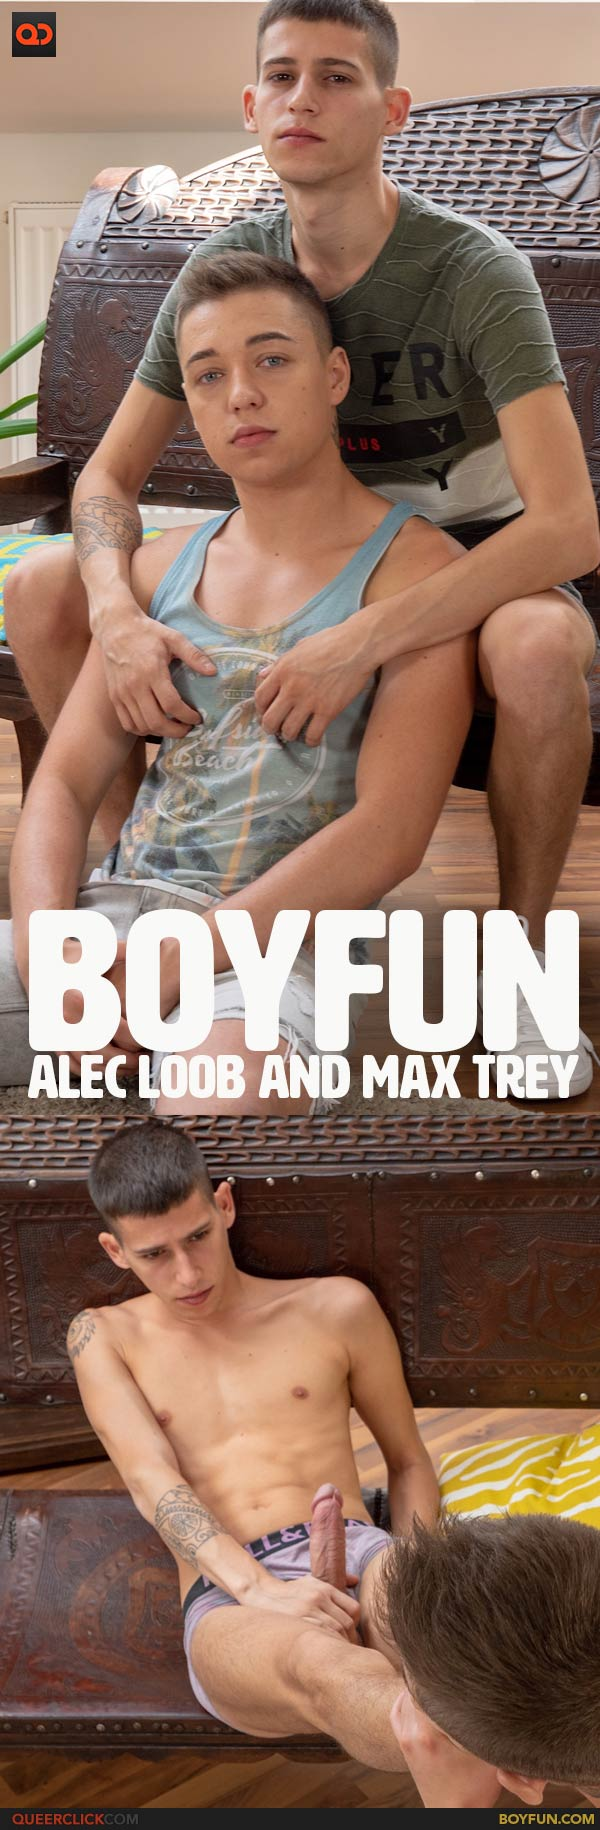 BoyFun: Alec Loob and Max Trey